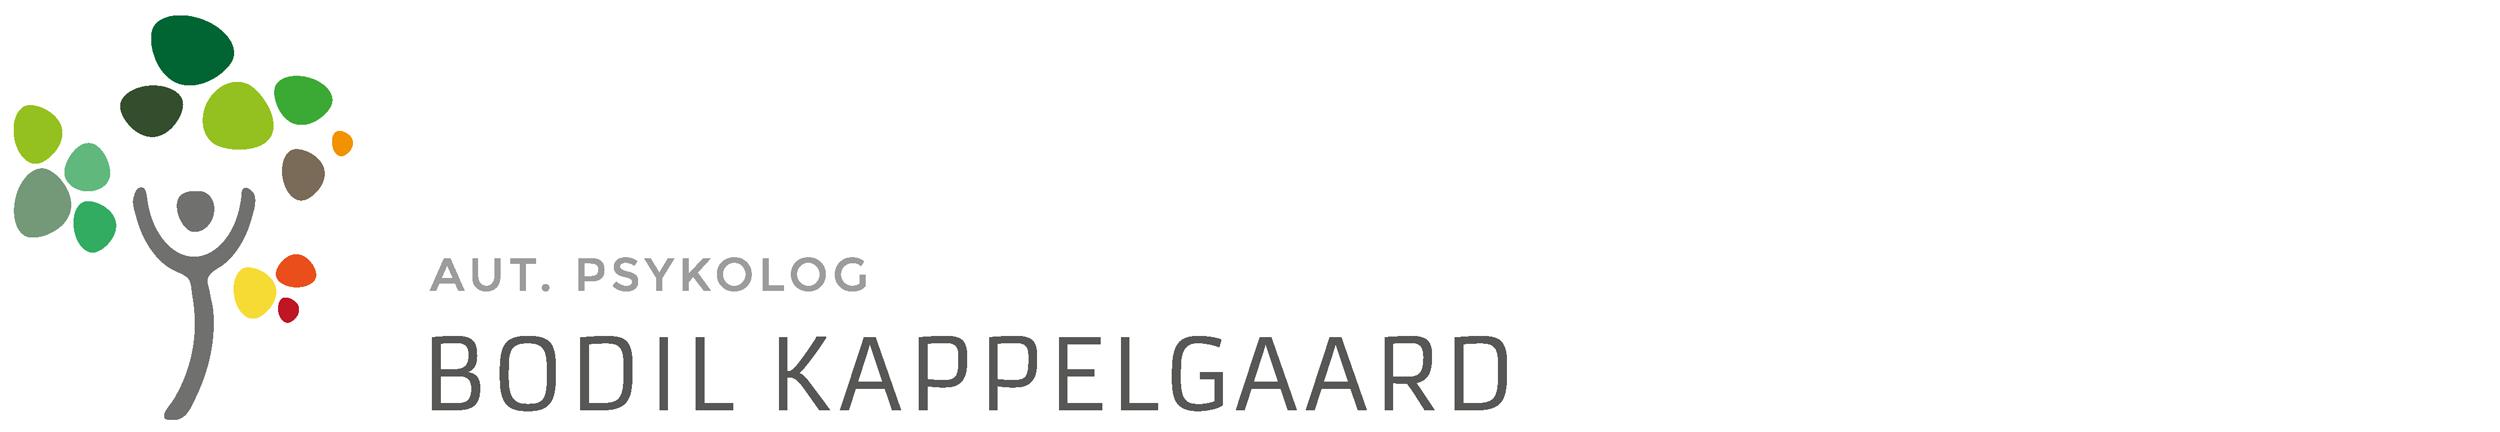 Psykolog Bodil Kappelgaard Logo